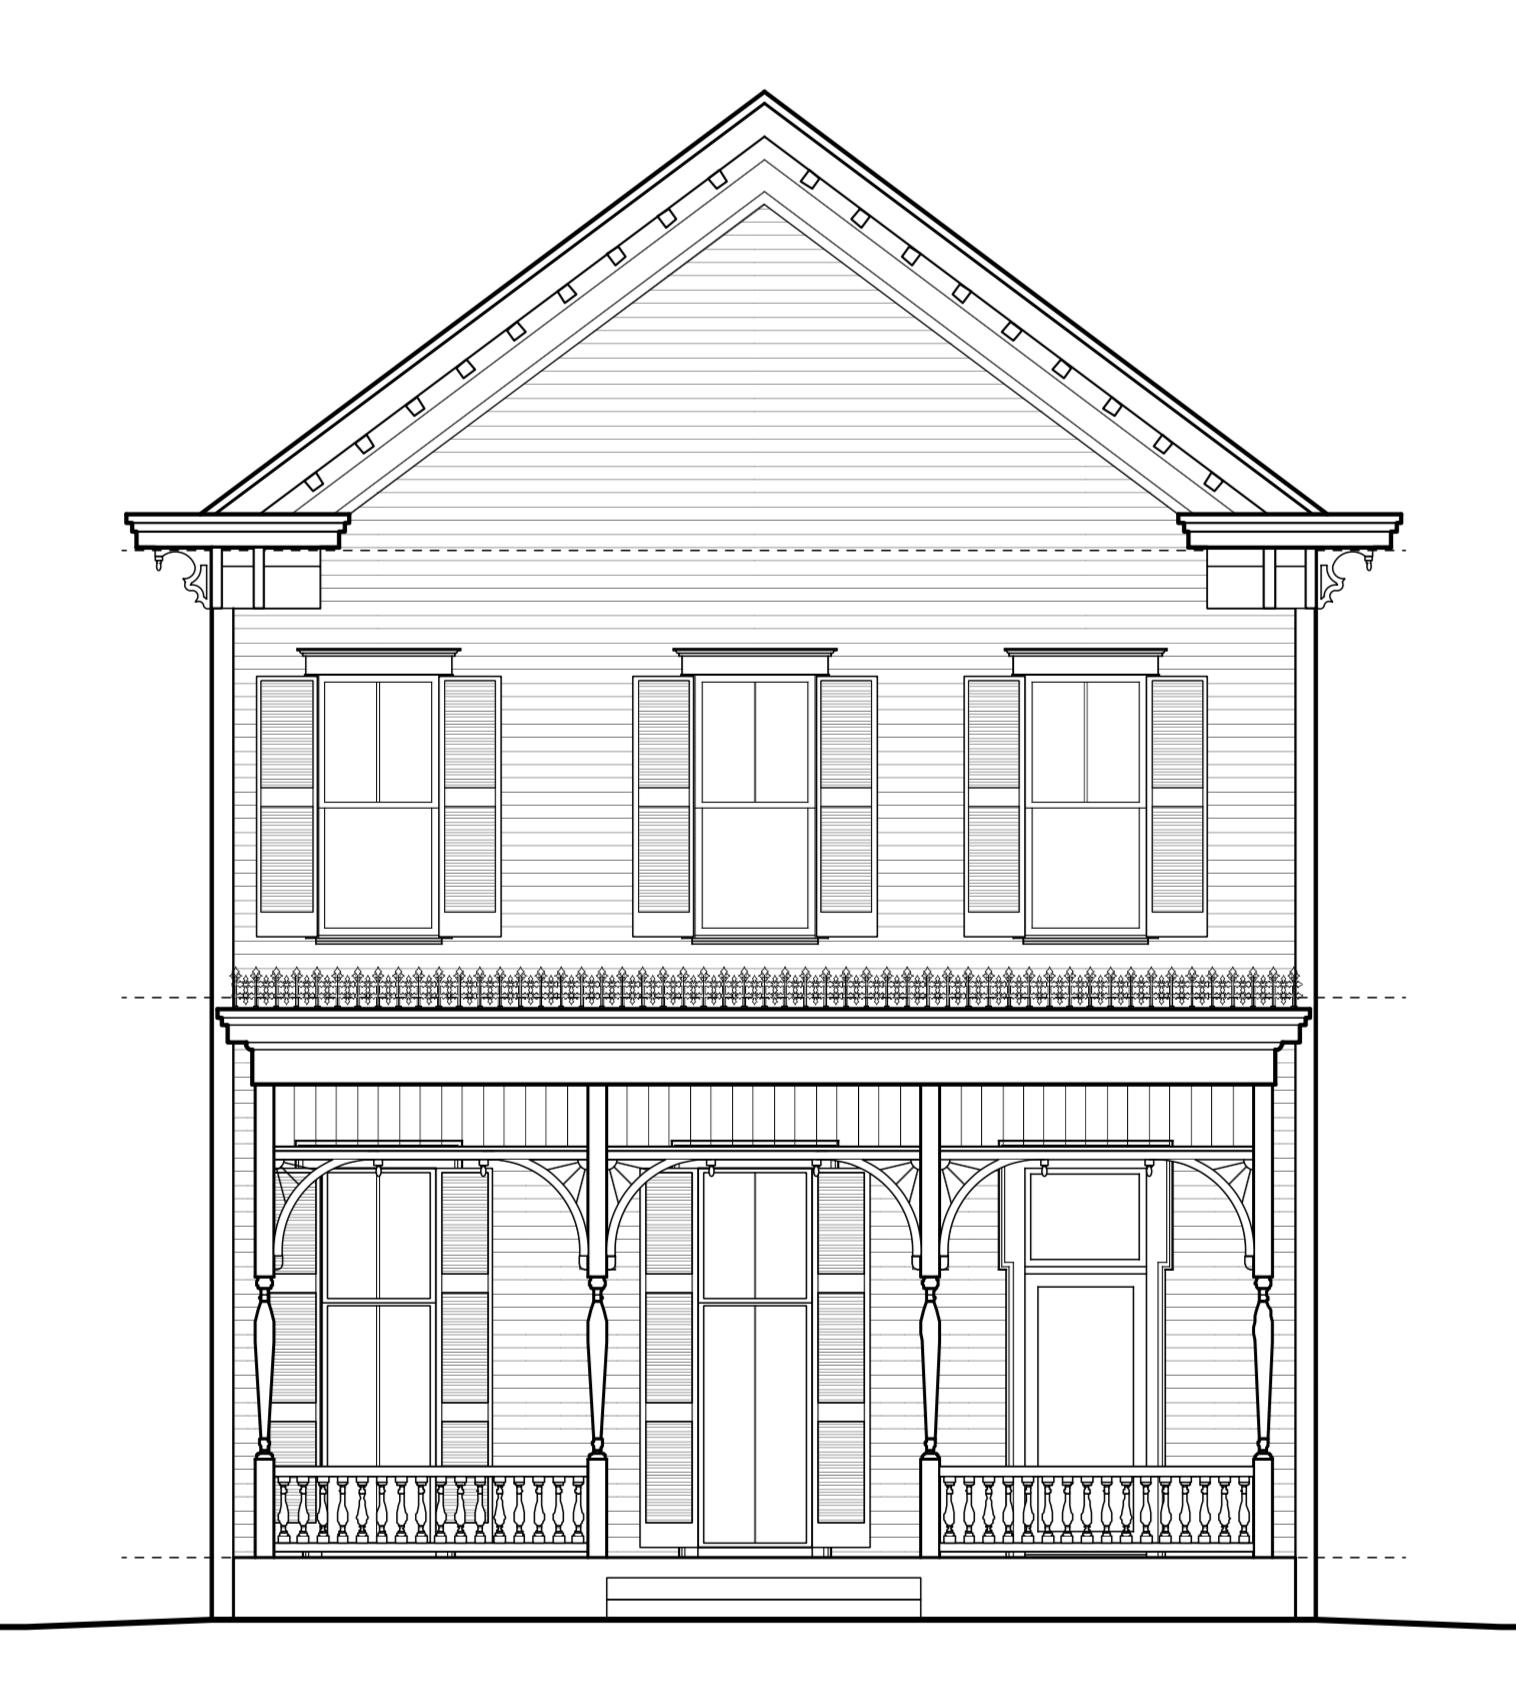 Pfeifer-Mandelbaum porch restoration designed by Rogue Architecture. 1872 Victorian residence, downtown Little Rock.